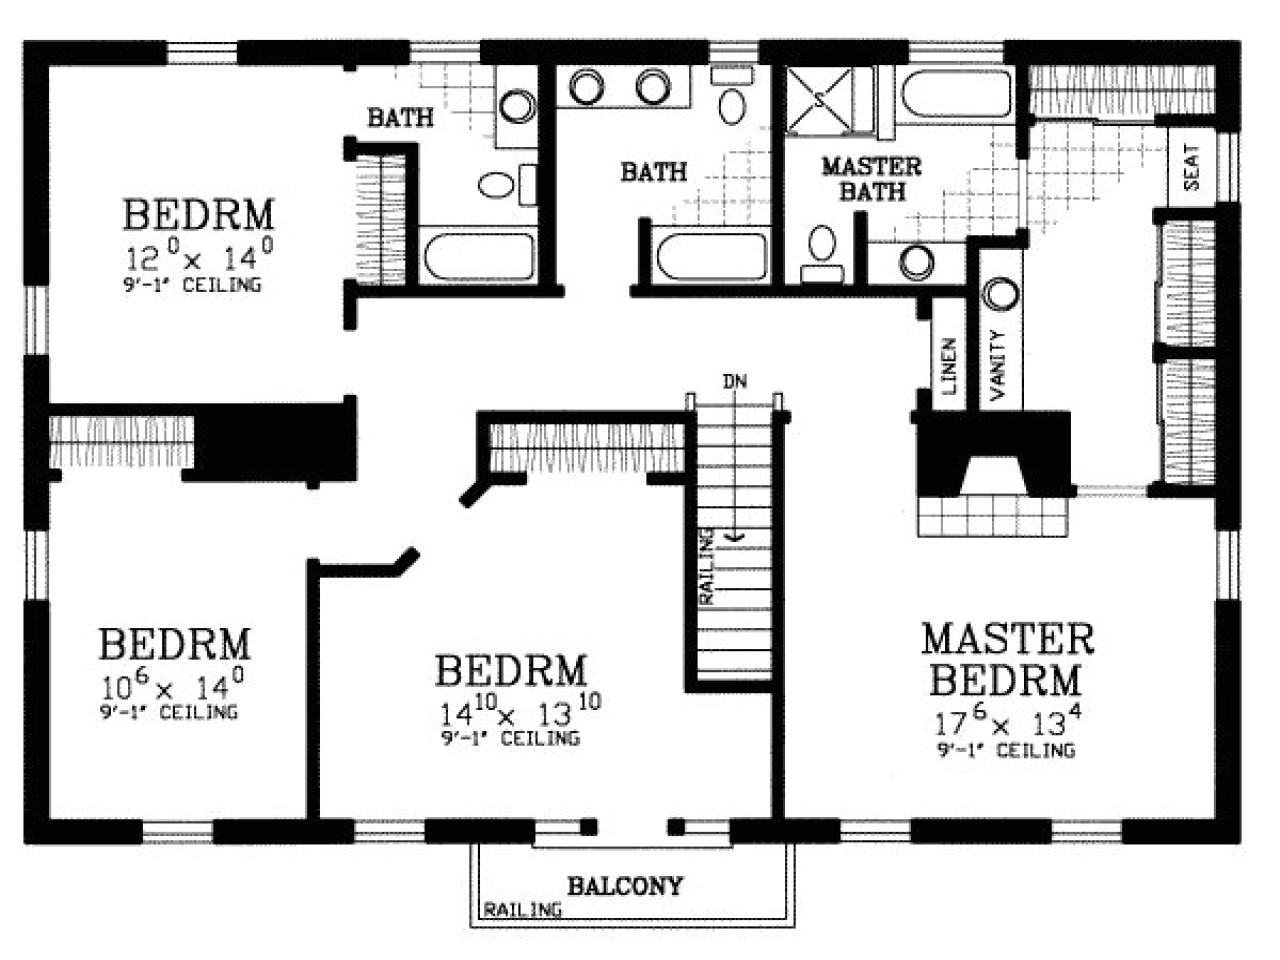 4 bedroom house floor plans free